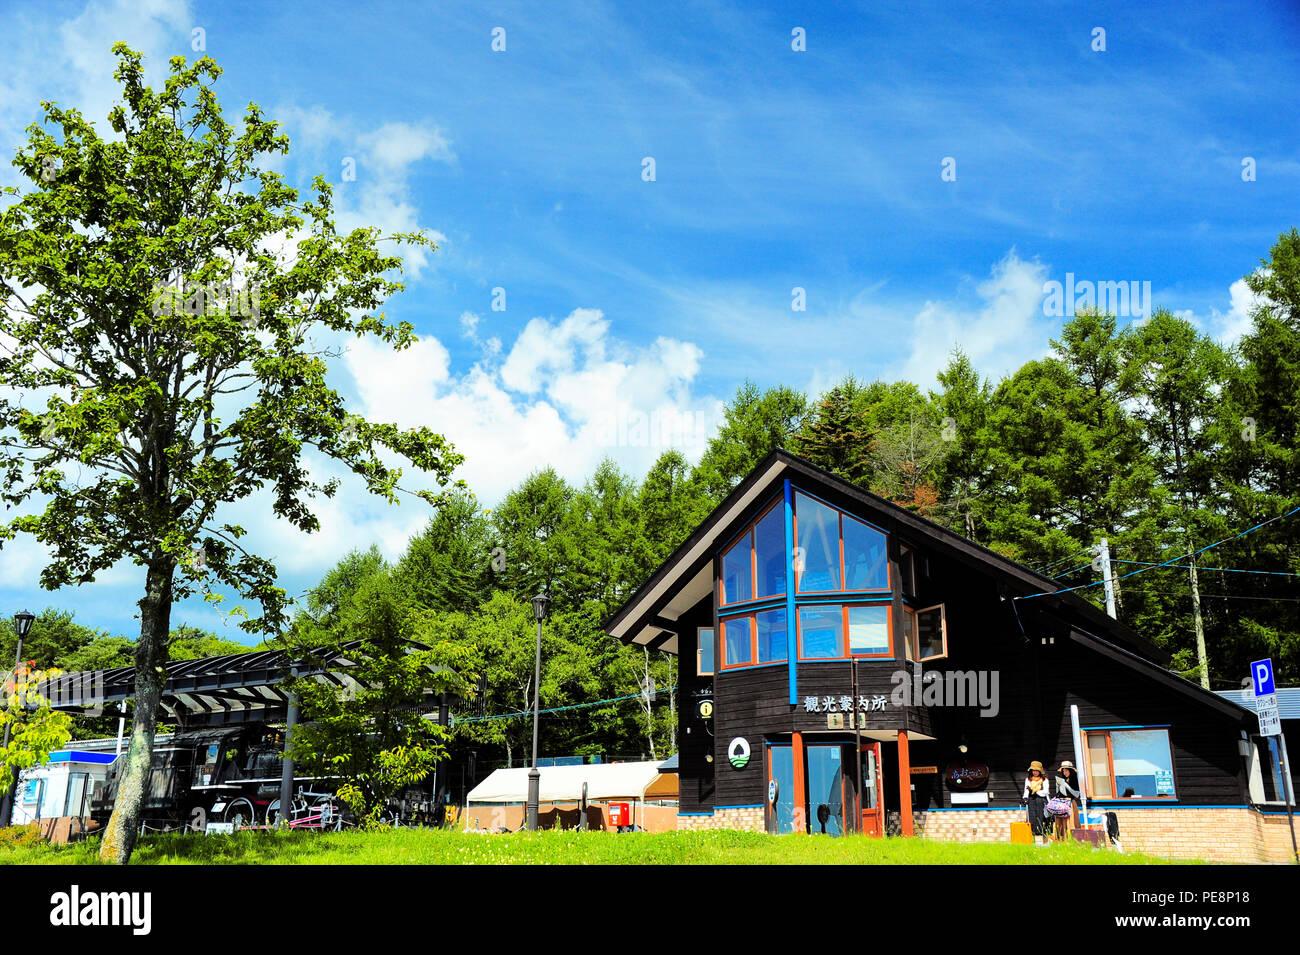 Tourist Information Center at the Kiyosato Railway Station - Stock Image